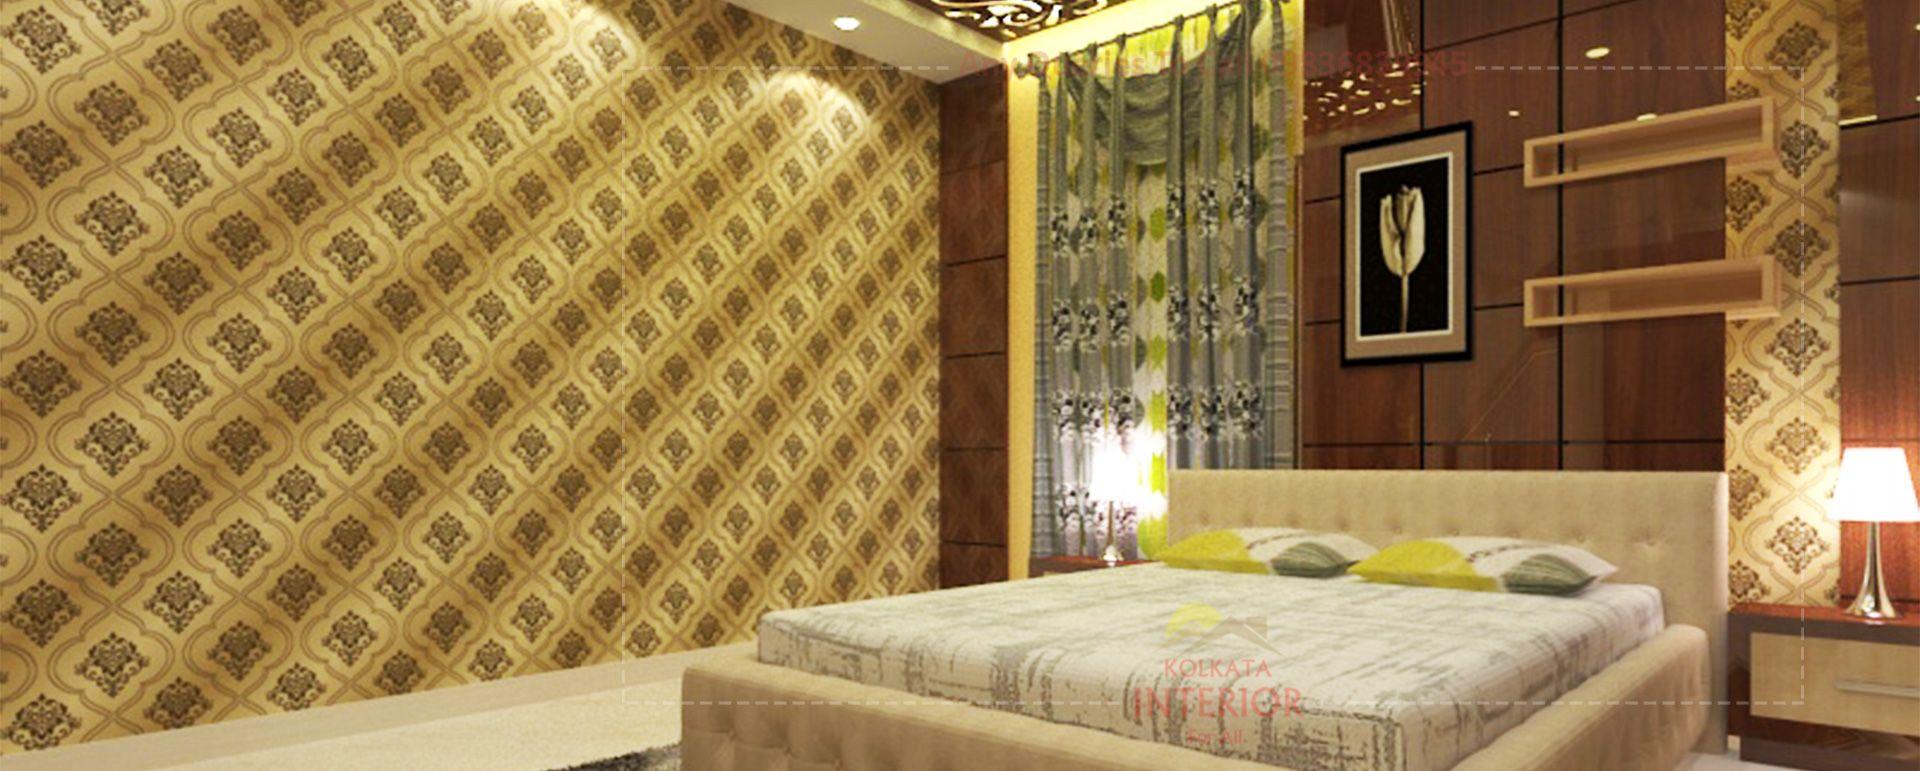 Top Interior Designer Salt Lake Kolkata Affordable Cost Kolkata Interior Designing Solutions Interior Design Top Interior Designers Double Bed Designs